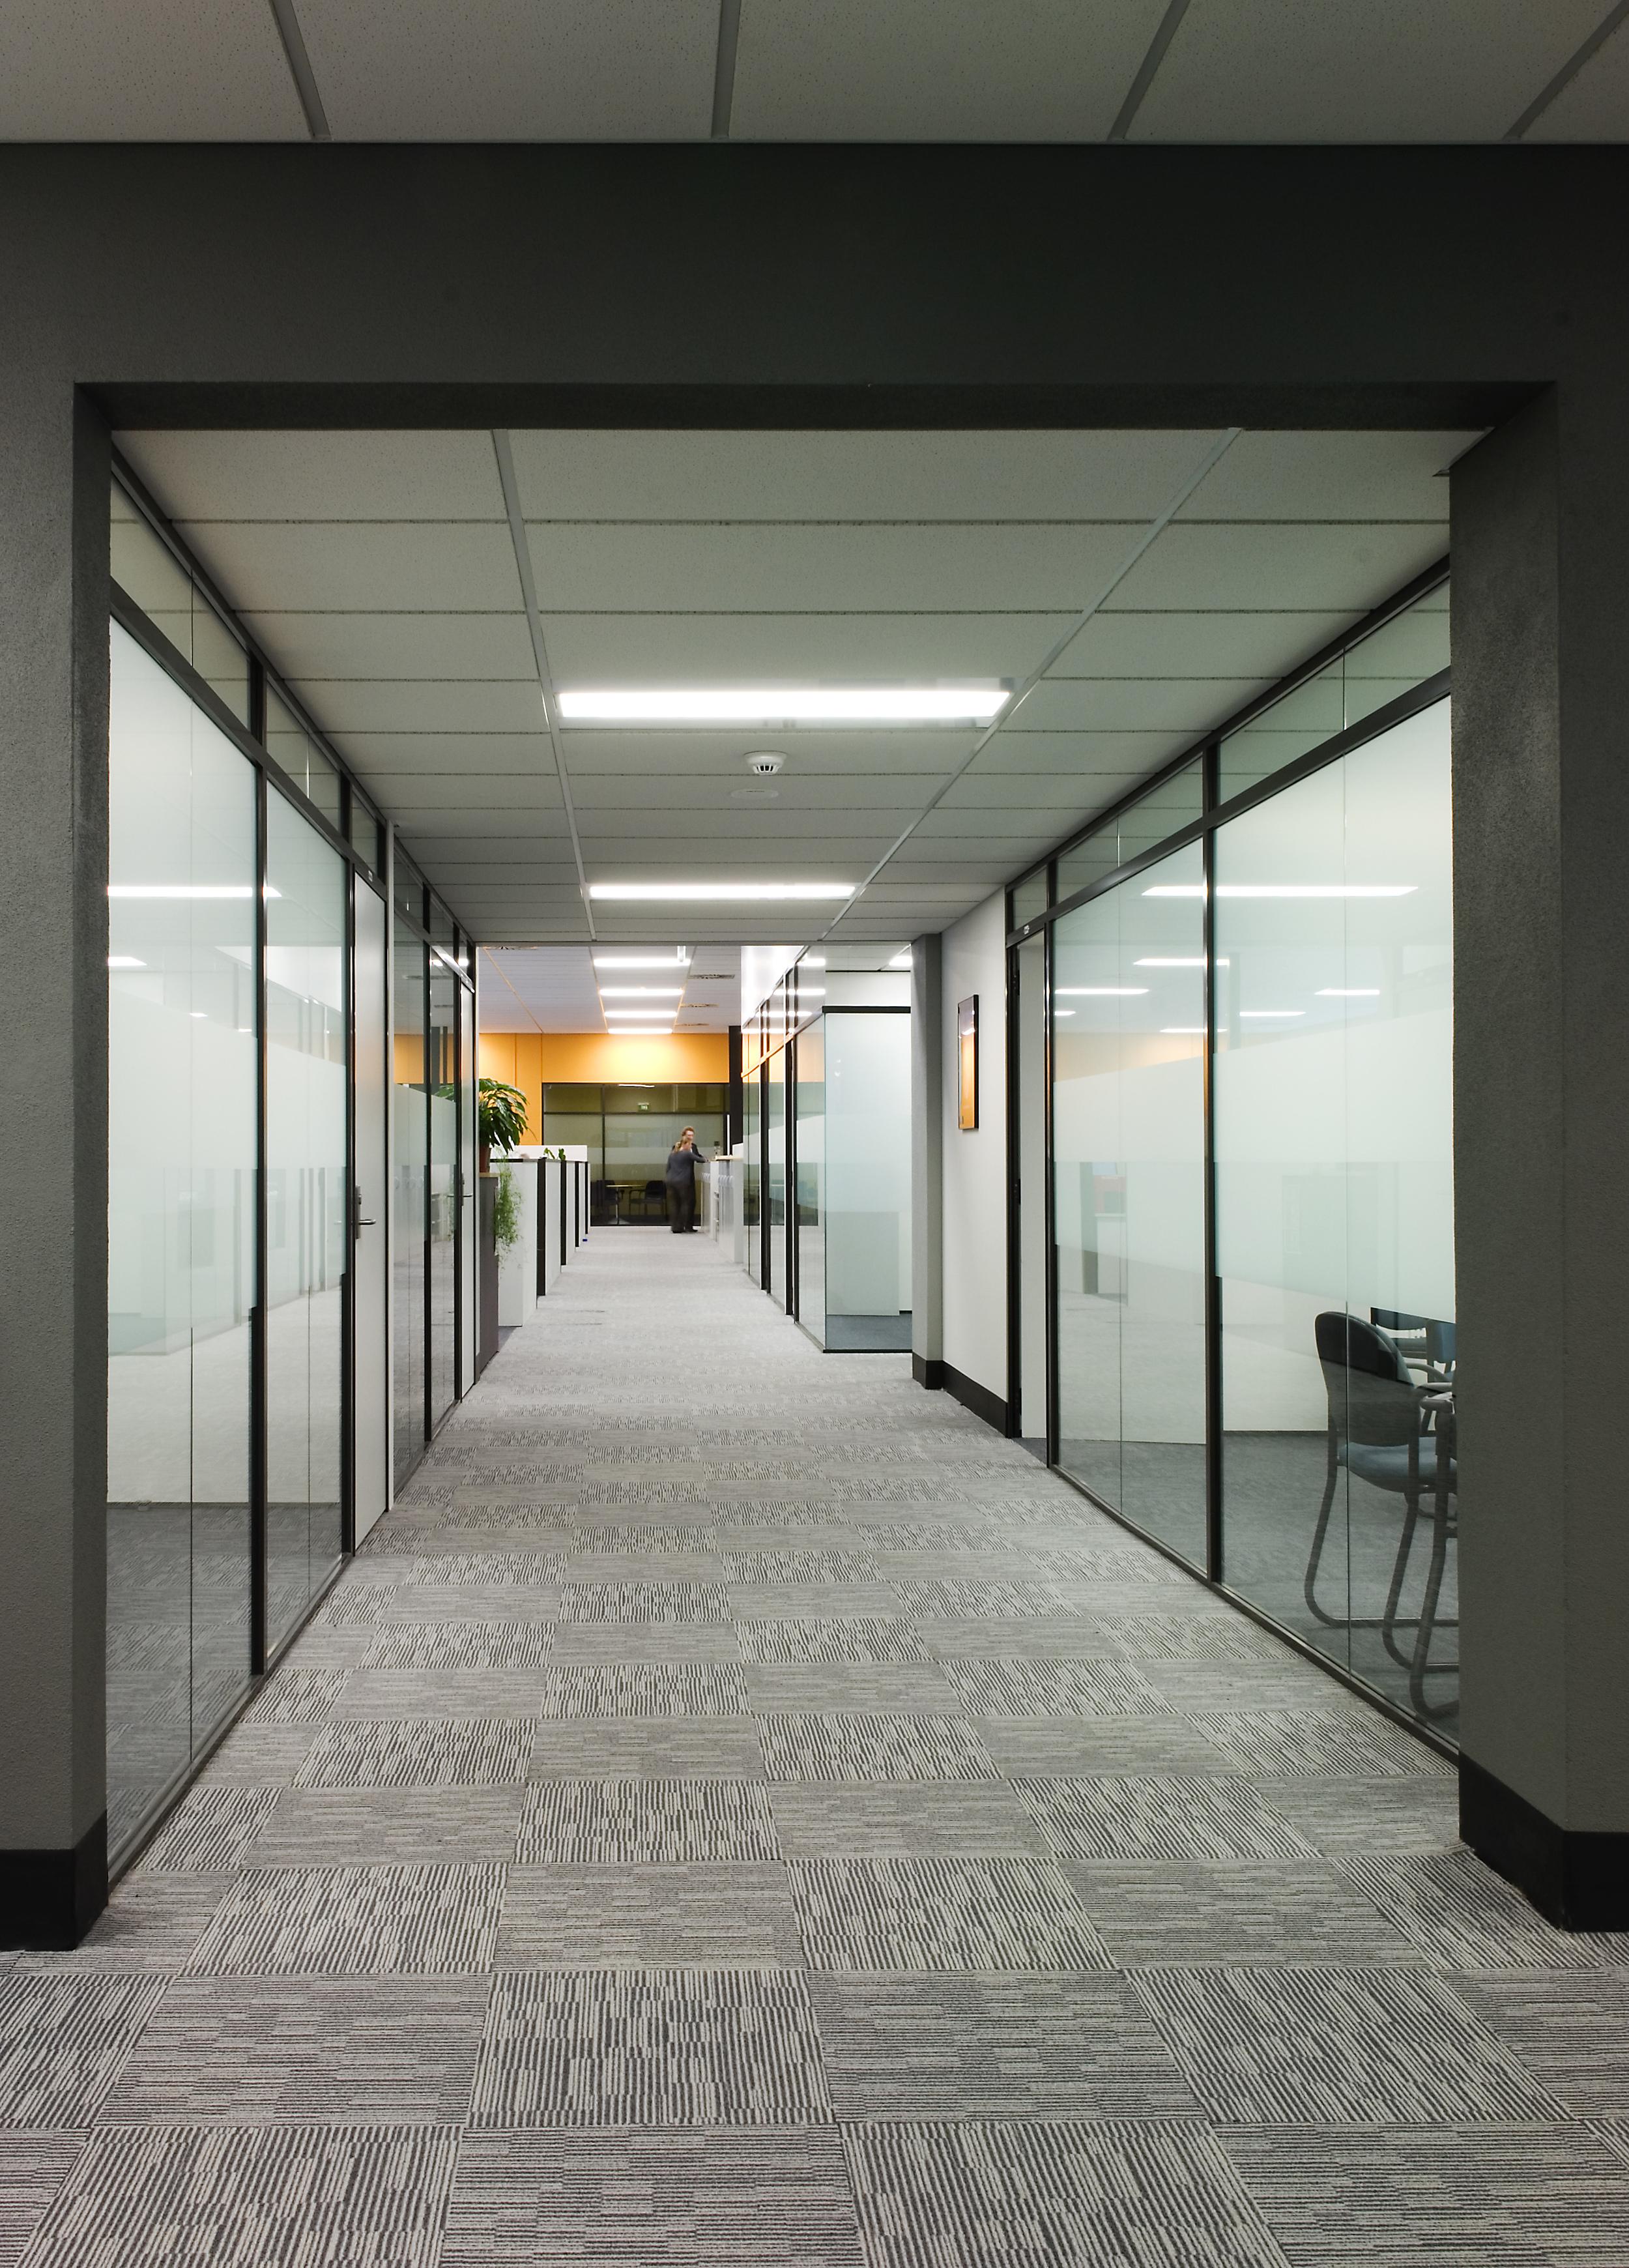 NZDF_TheHub_Interior_09.jpg